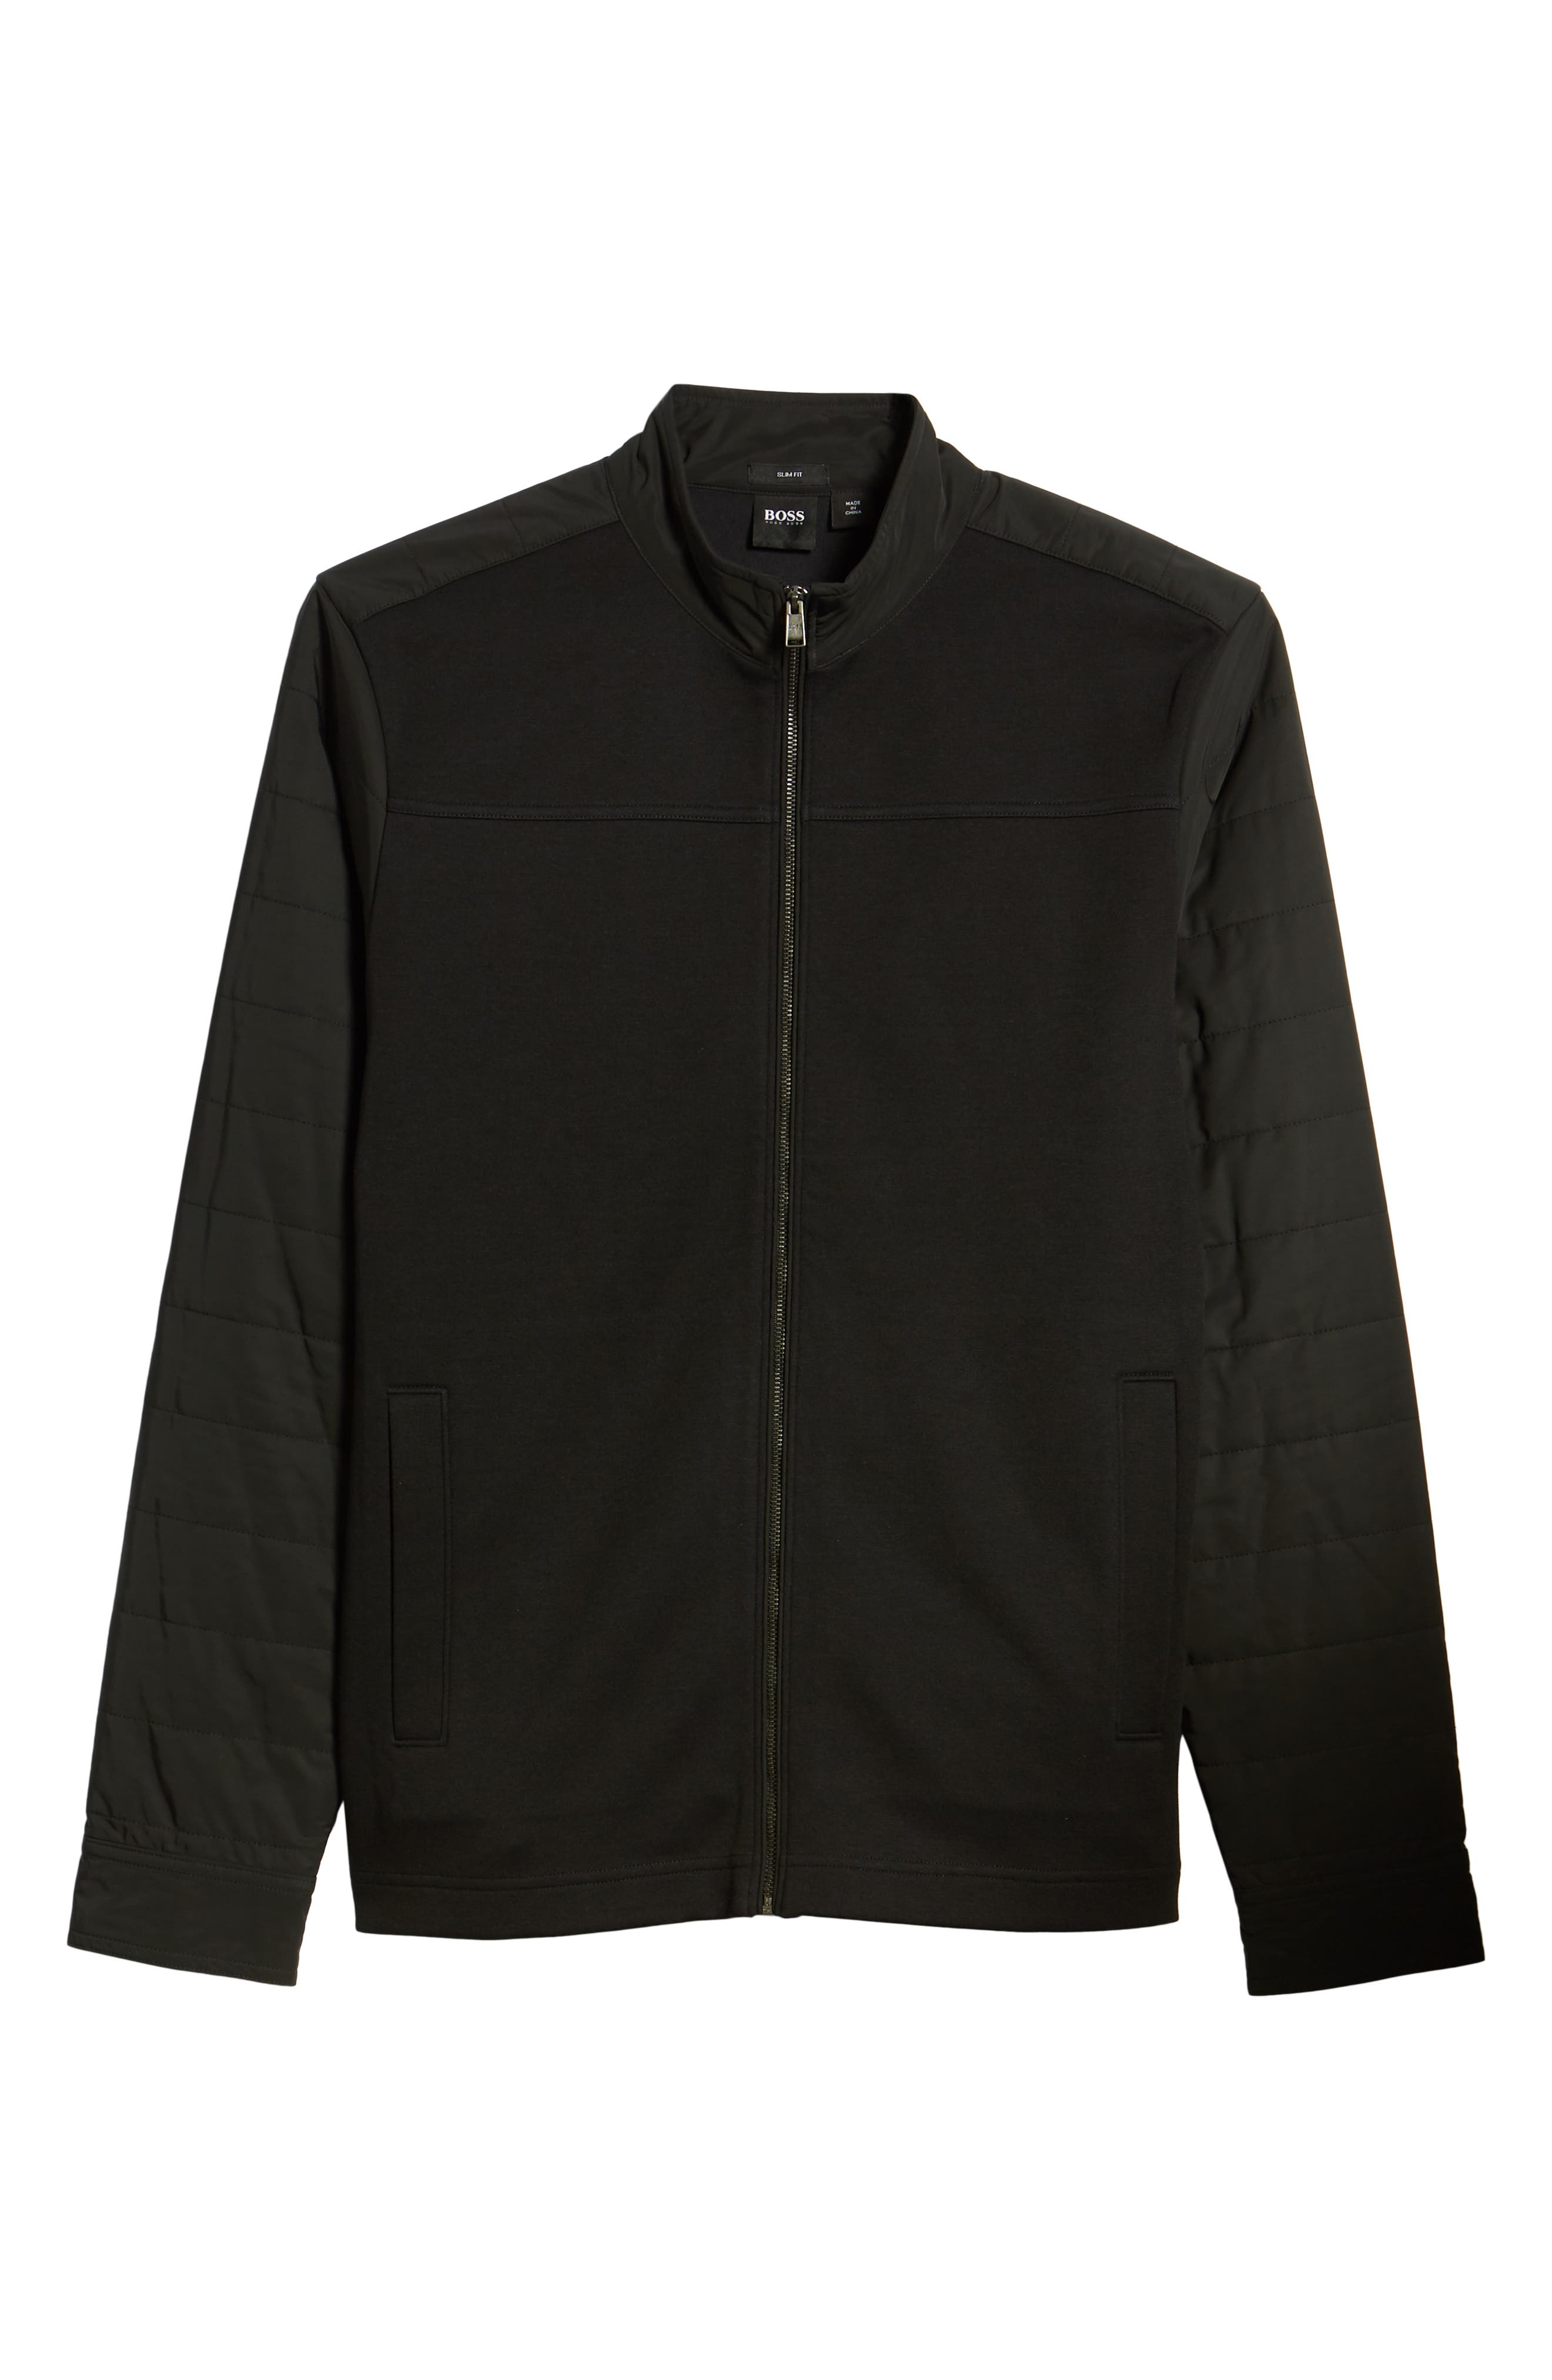 Soule Slim Fit Moto Jacket,                             Alternate thumbnail 7, color,                             BLACK